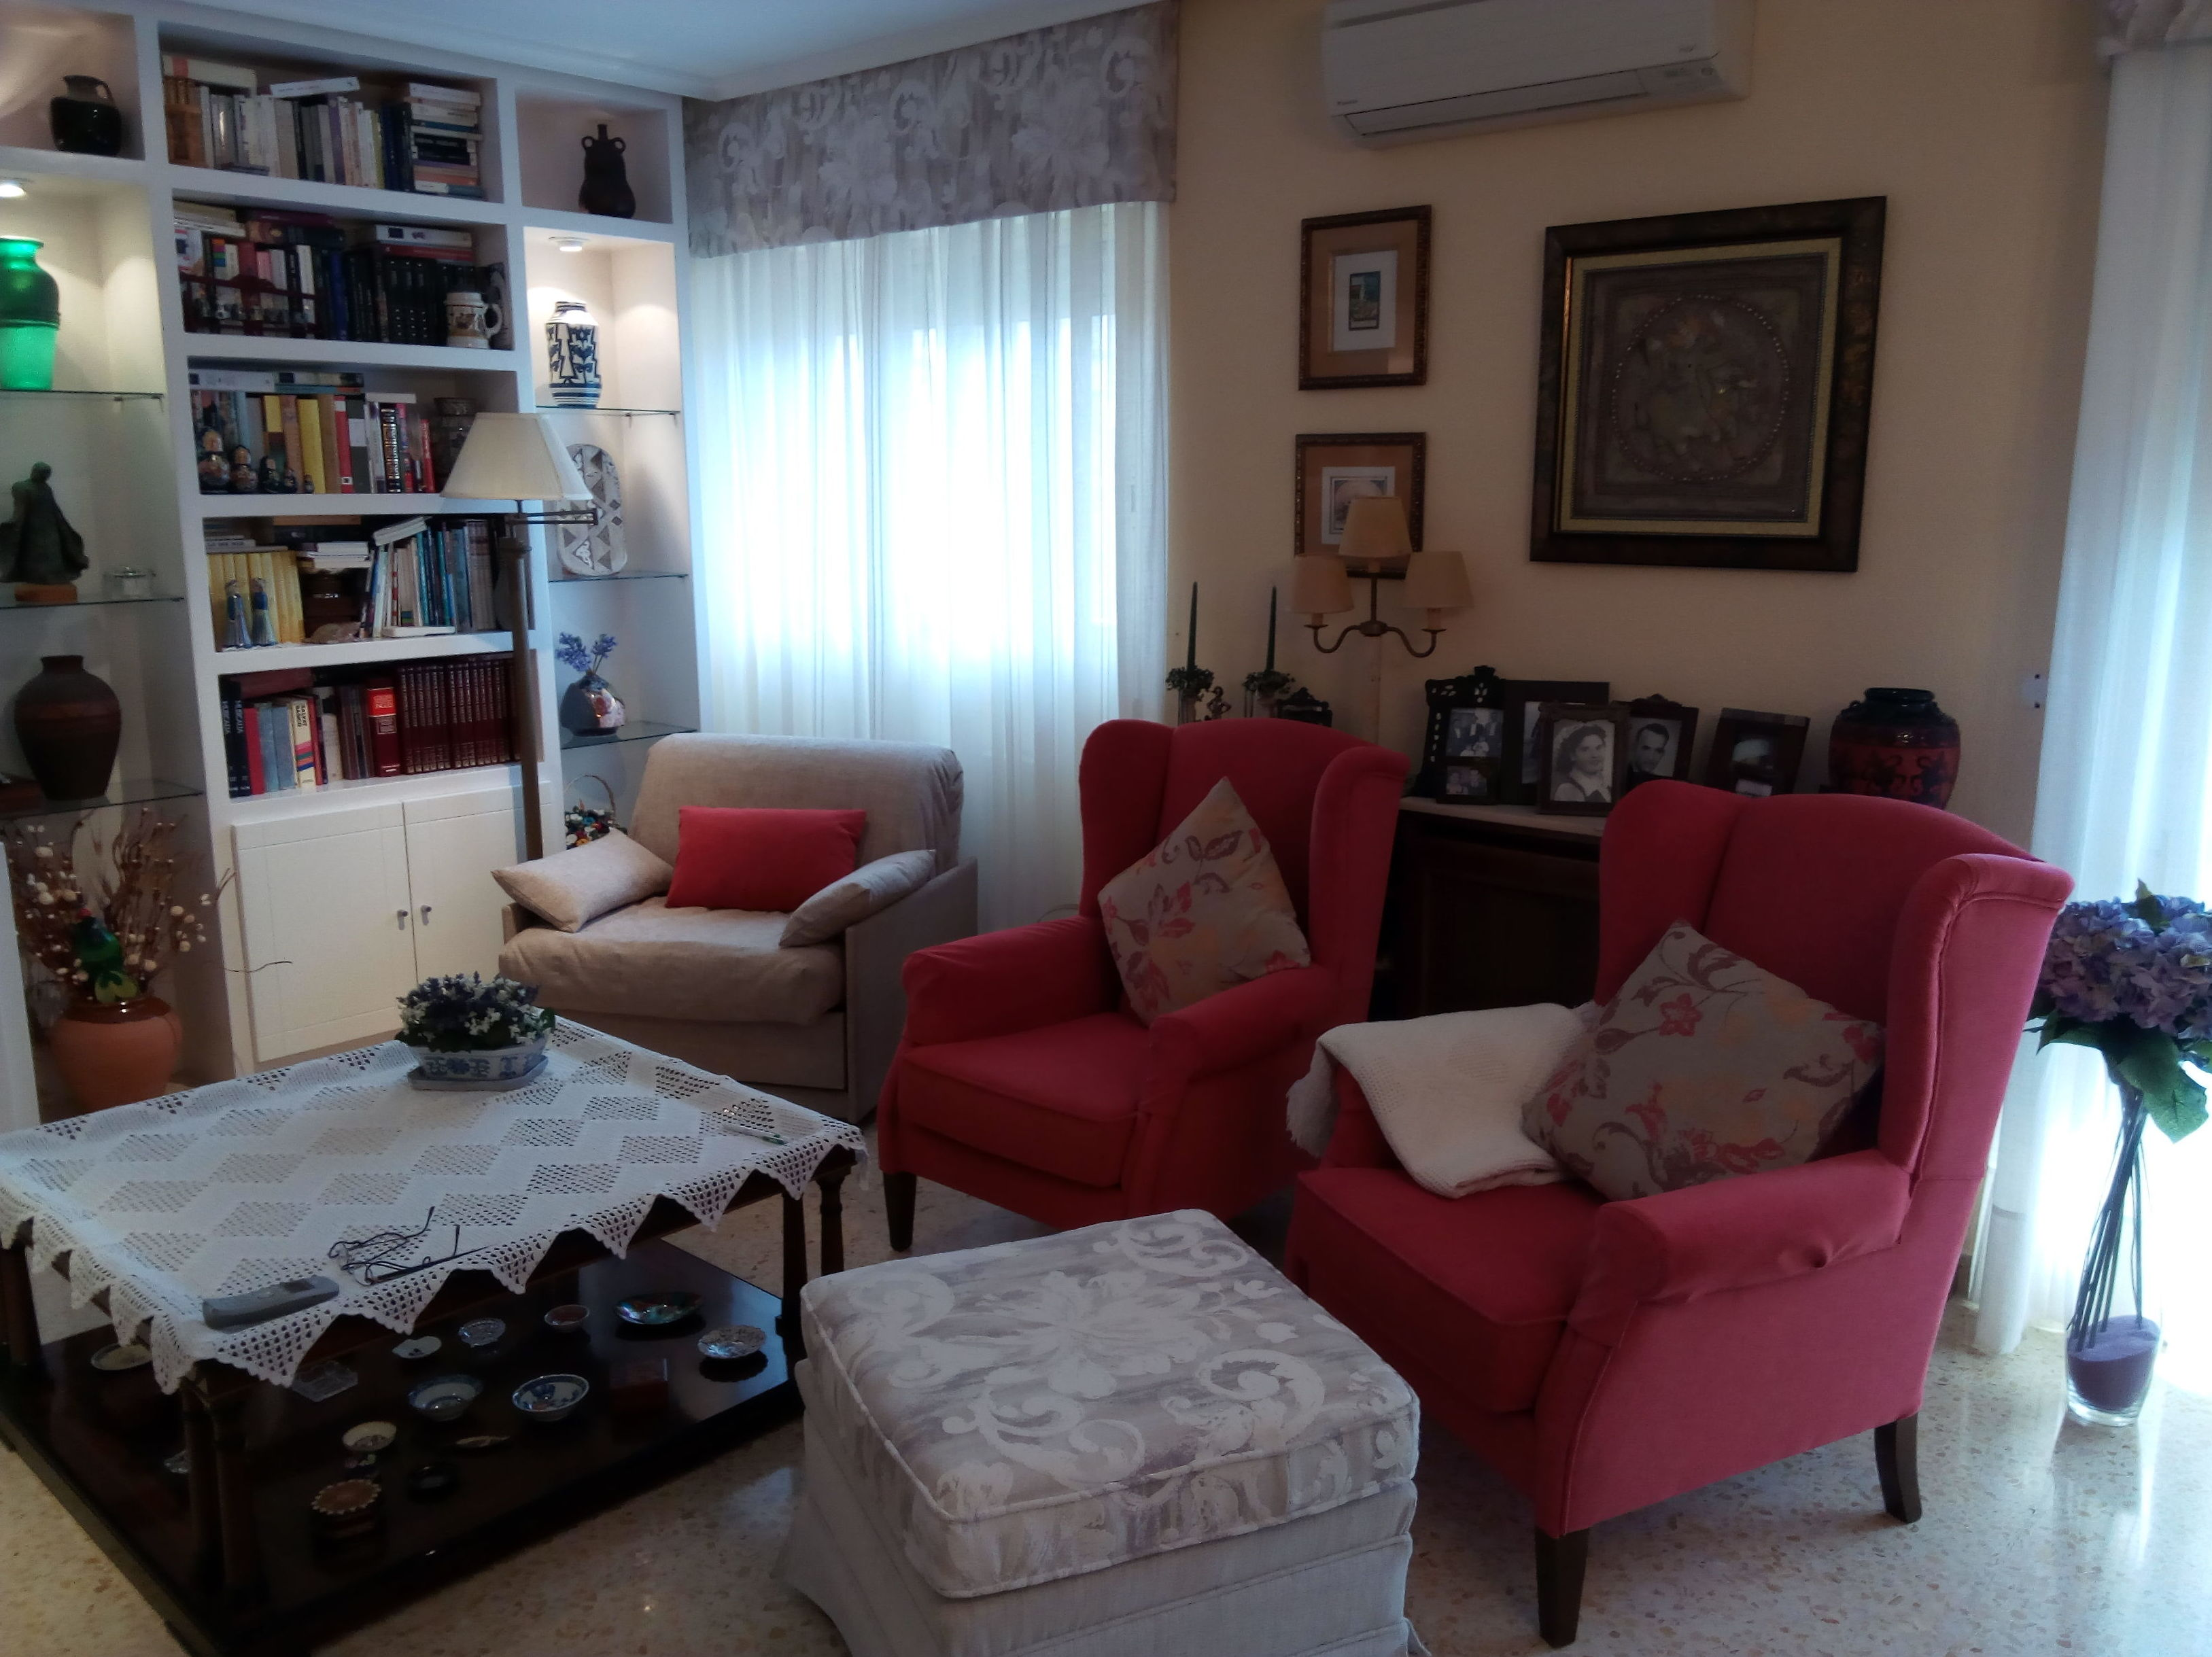 Foto 4 de tapicer as en zaragoza tapicer a bern - Tapicerias en zaragoza ...